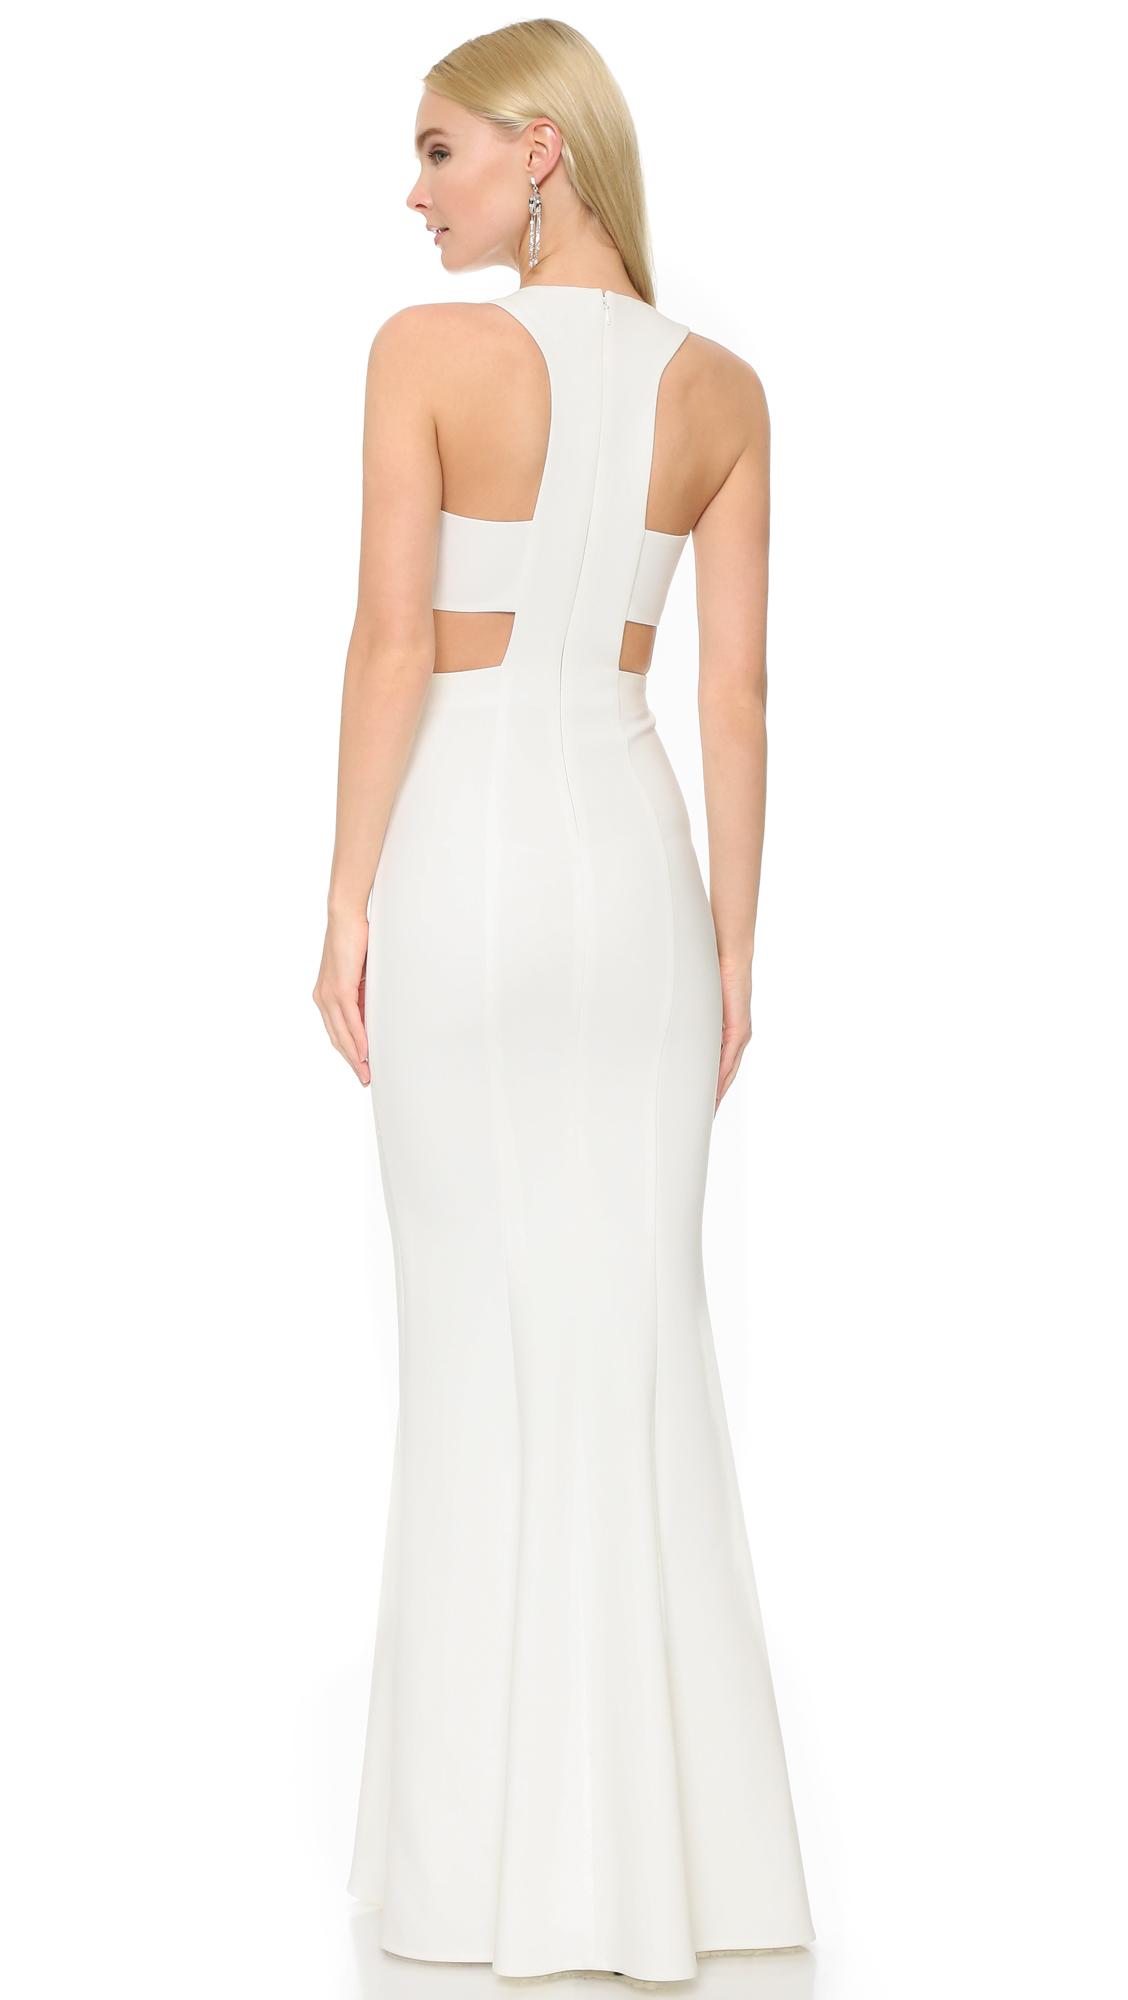 Charmant Elizabeth James Wedding Dresses Galerie - Brautkleider ...